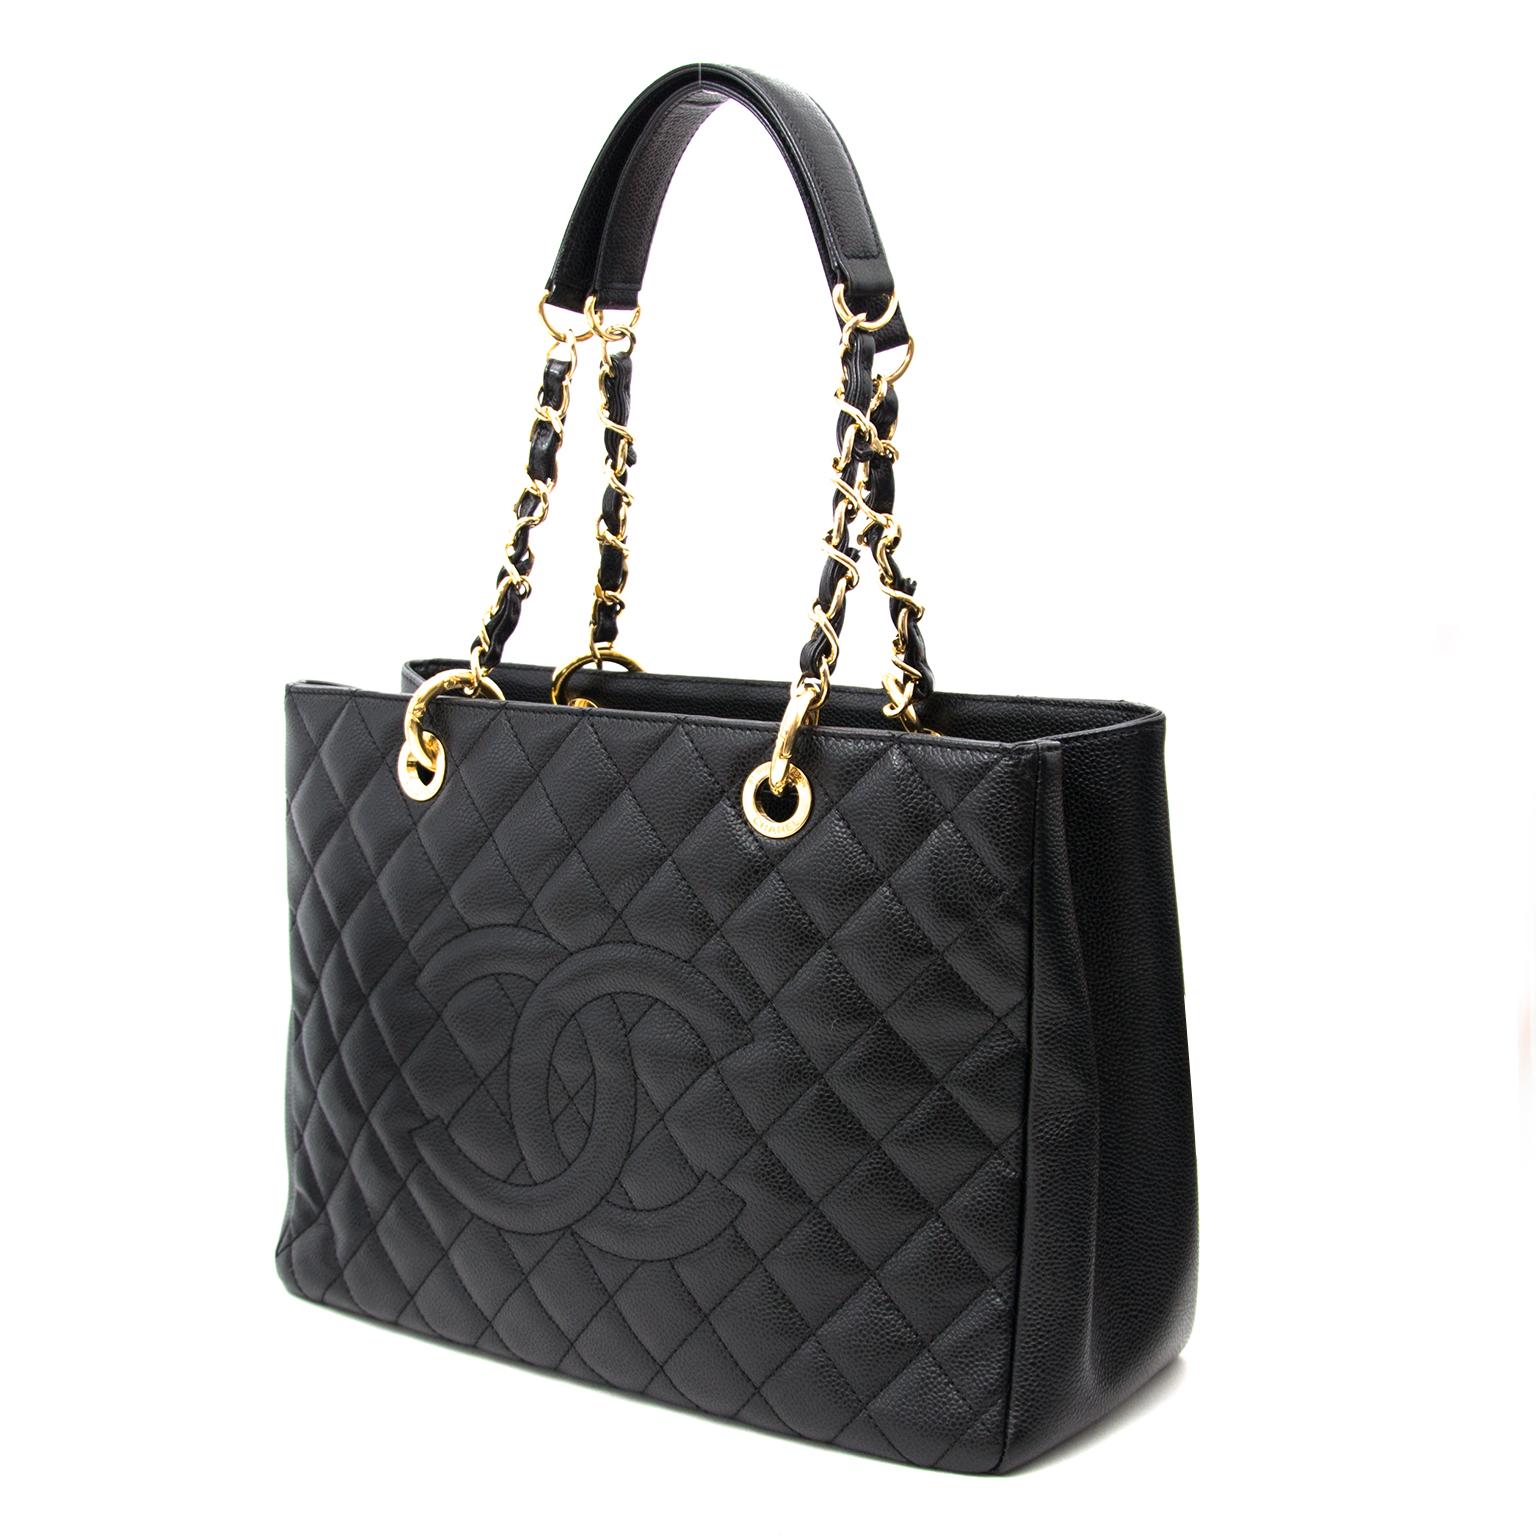 31db777aac9b3 Labellov Shop safe online  authentic vintage Chanel clothes